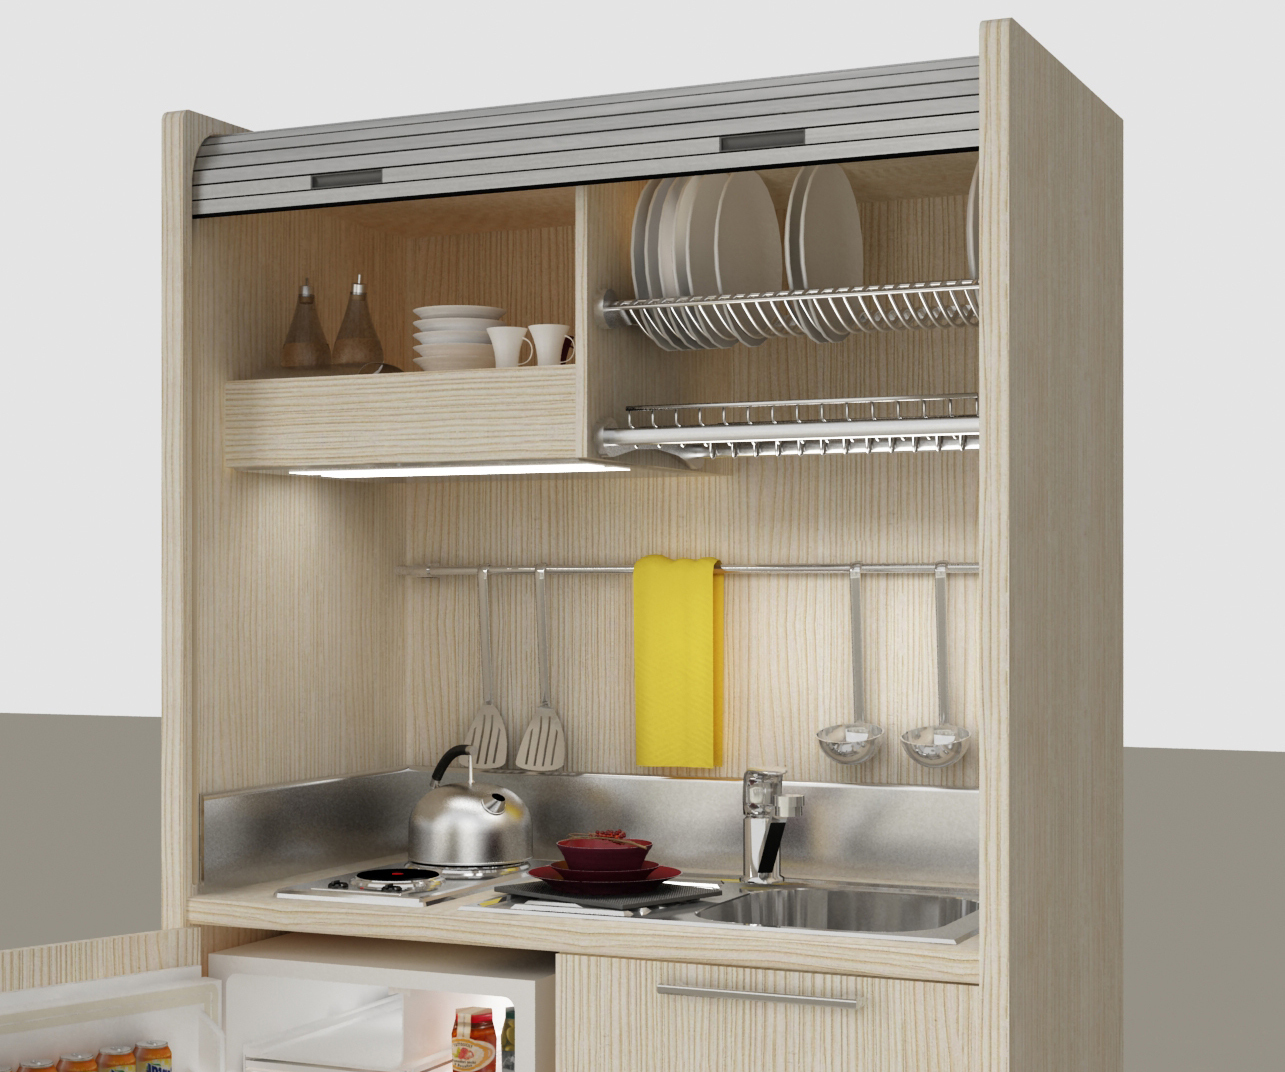 Stunning Mini Cucine Monoblocco Photos - Home Design - joygree.info